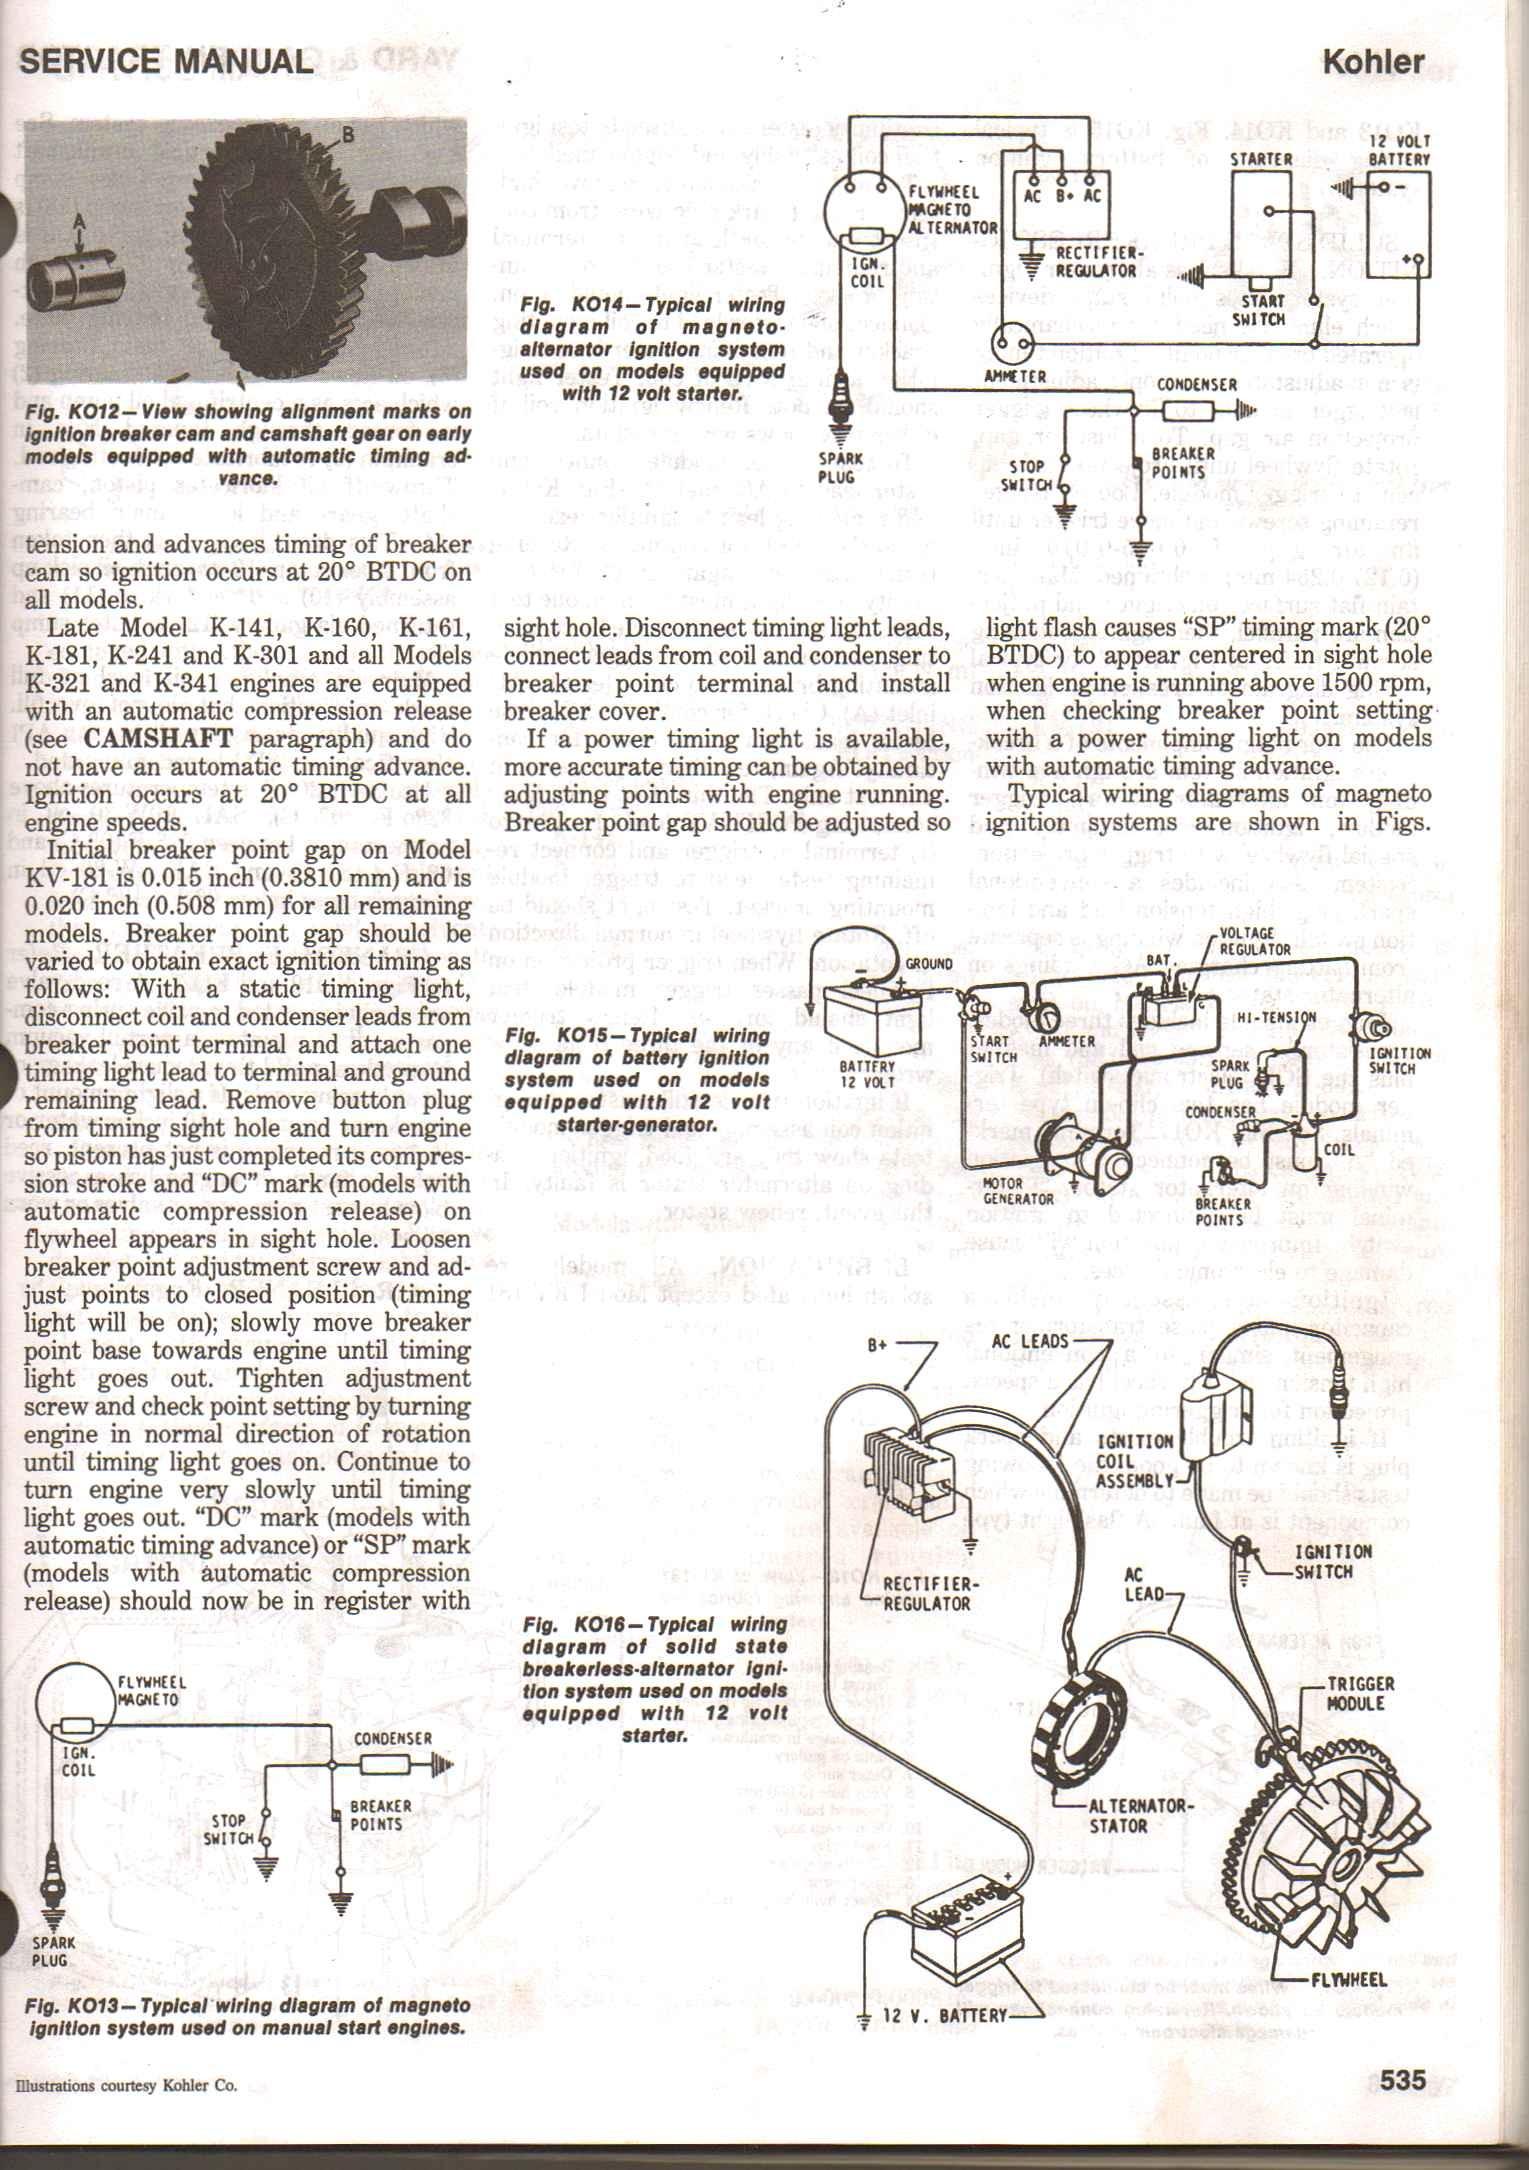 Kohler K301 Engine Diagram Parts New K301s Diagrams I Have A That M Working On Noticed